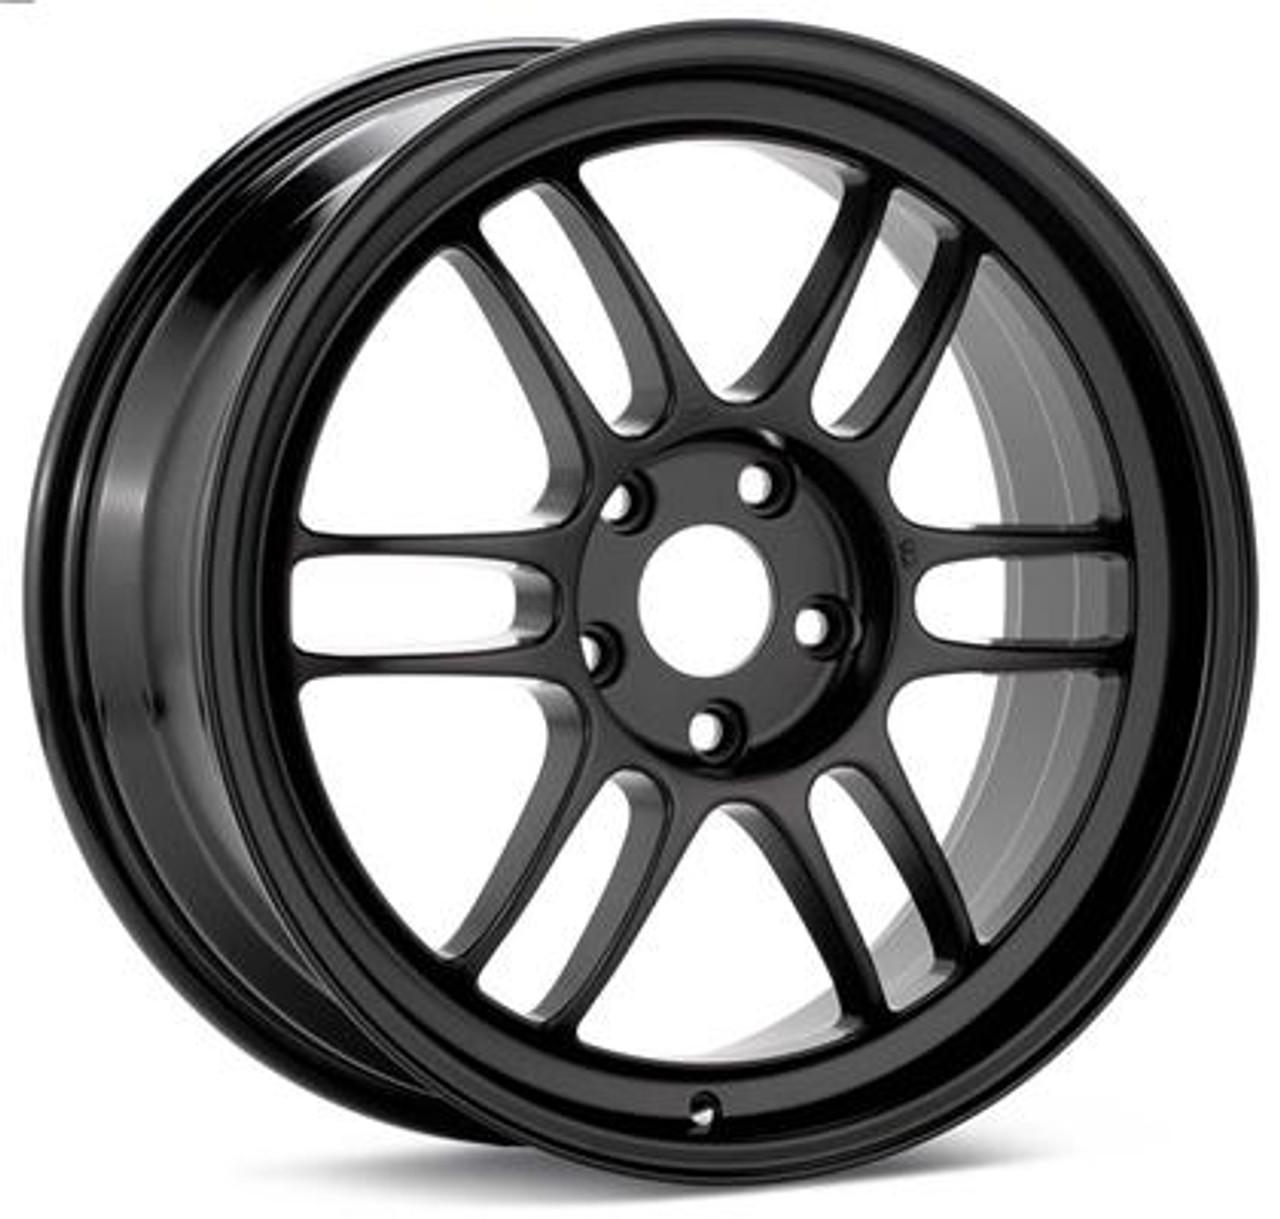 Enkei - RPF1 Wheels (Matte Black)